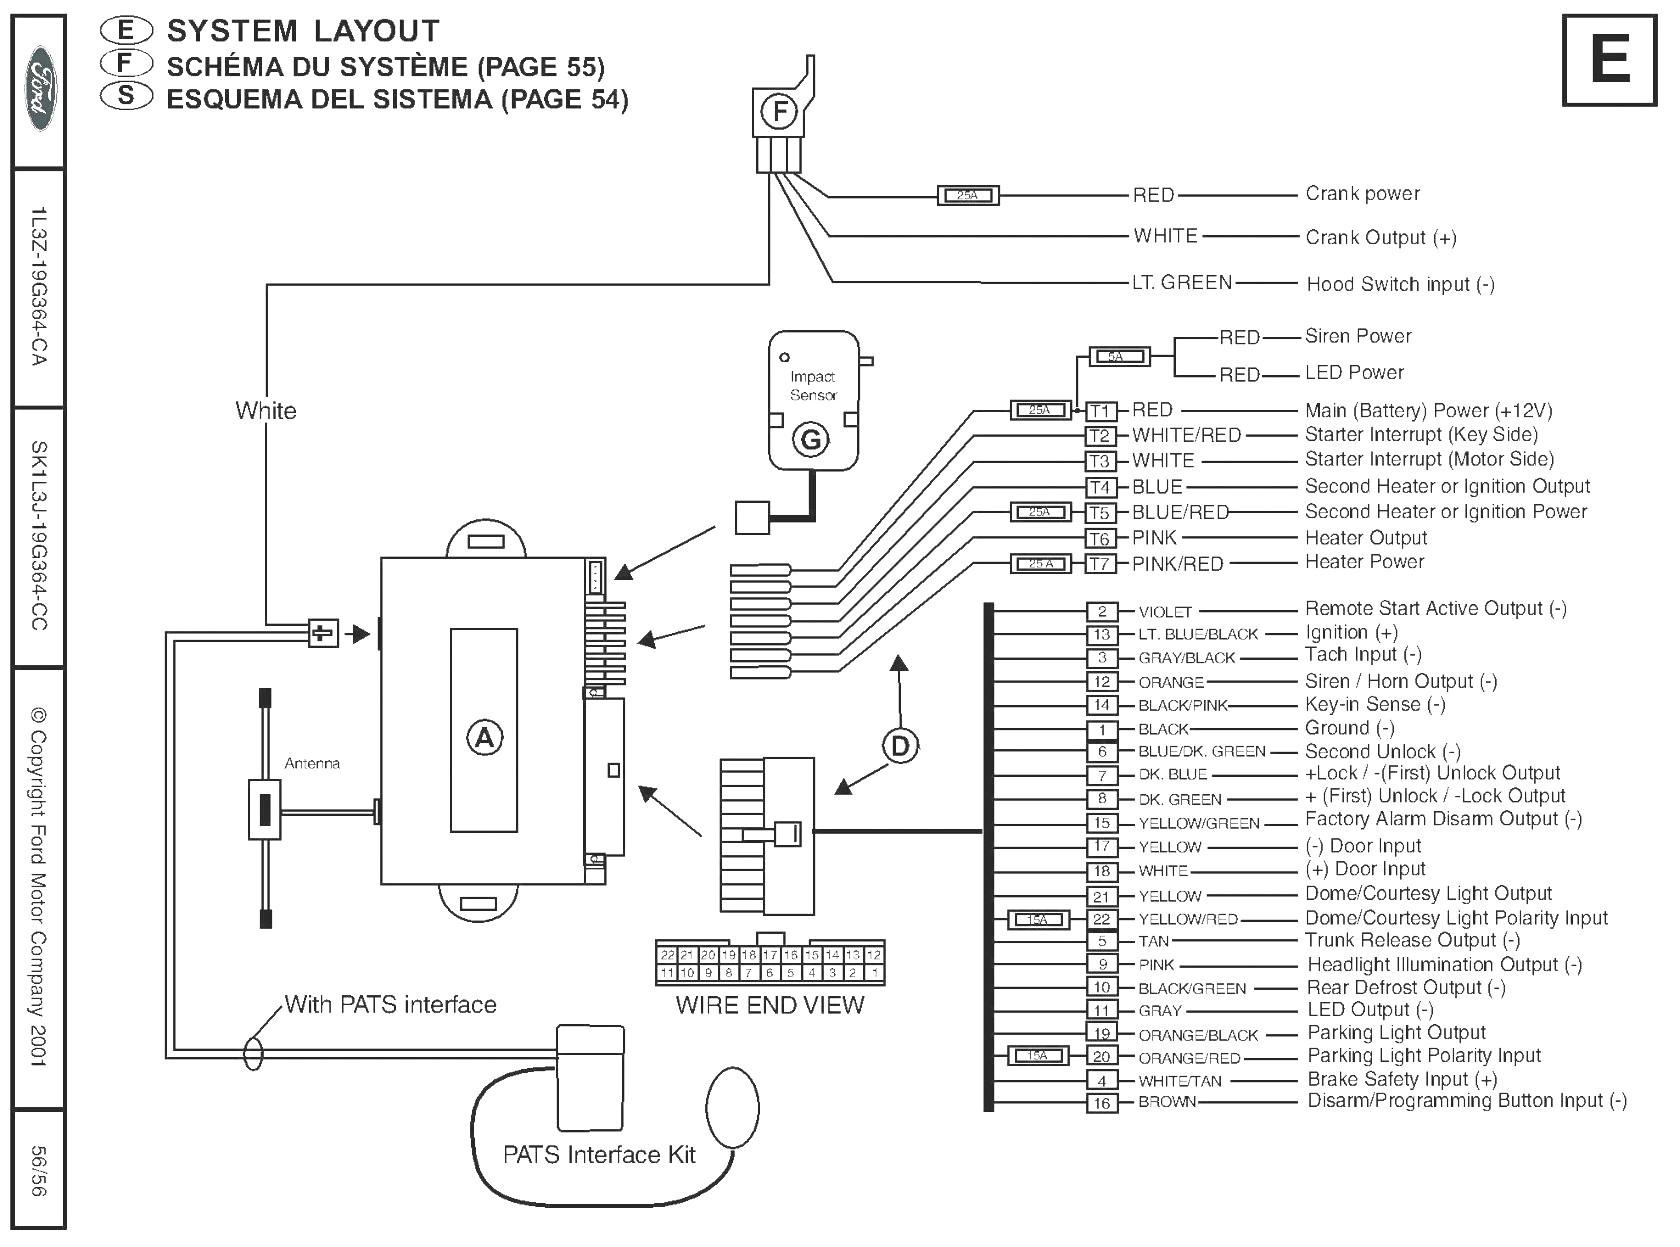 karr wiring diagram wiring diagram article review karr security system wiring diagram karr car alarm wiring